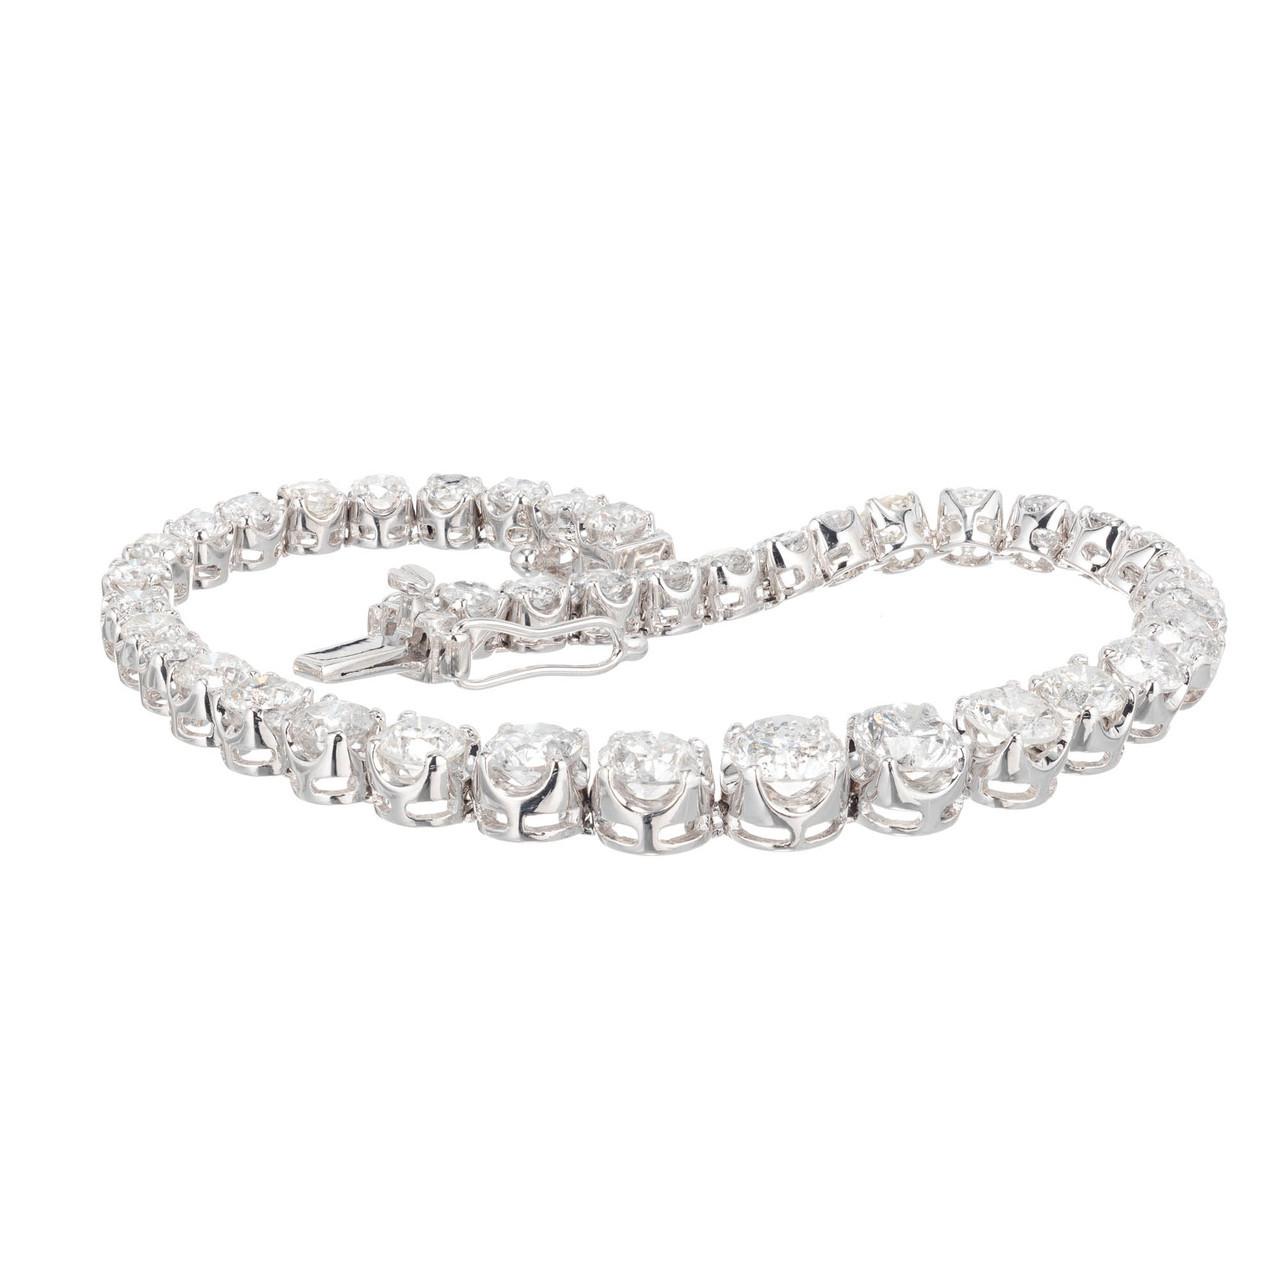 7136052509710 Orianne Graduated 8.00ct Diamond Bracelet 14k White Gold